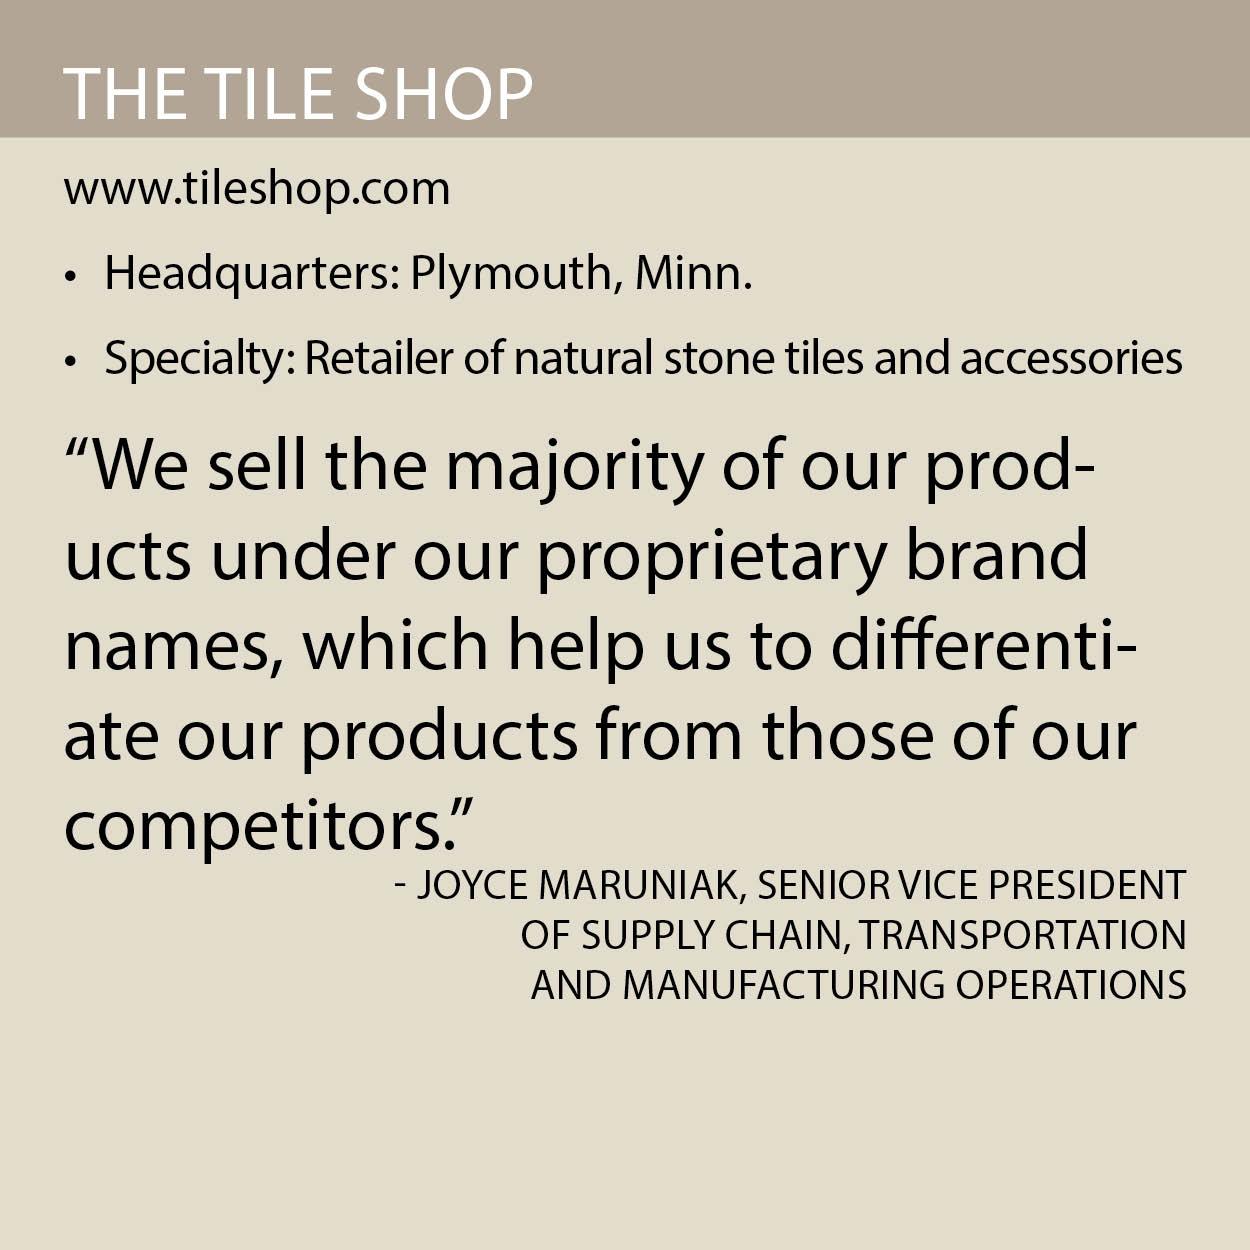 http scw mag com profiles 886 the tile shop